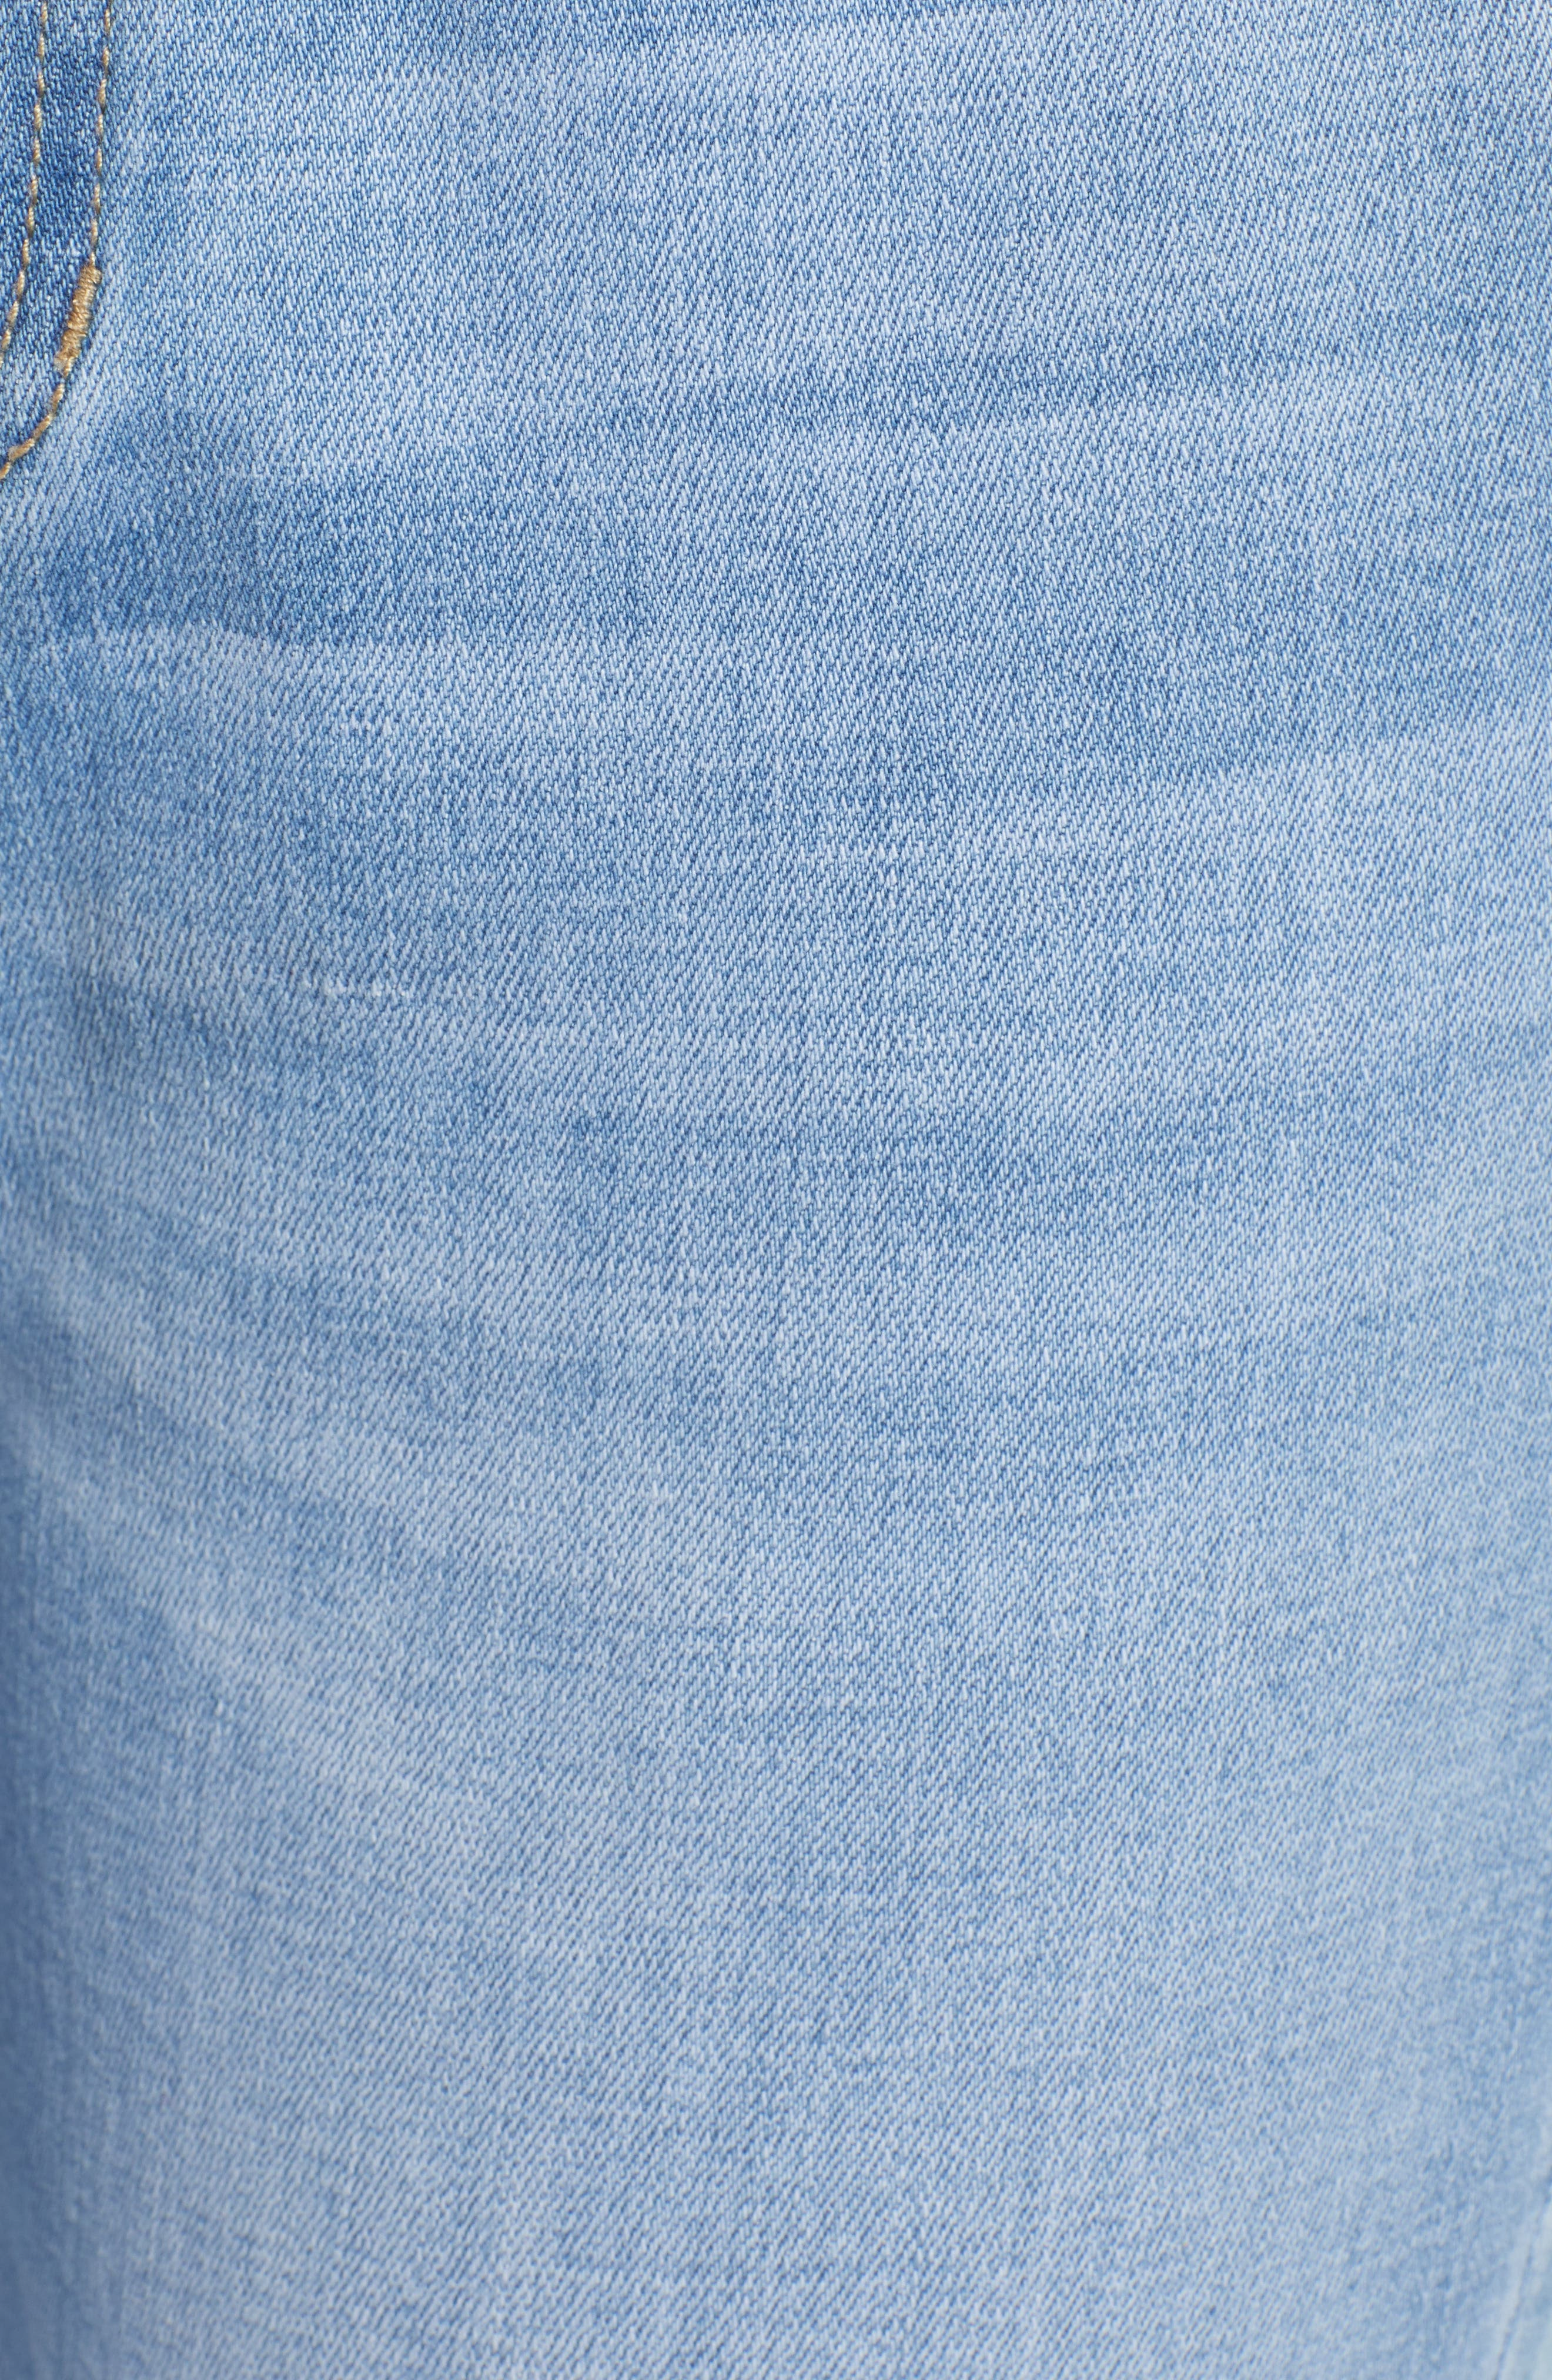 PROSPERITY DENIM, Paperbag Waist Skinny Jeans, Alternate thumbnail 6, color, MEDIUM WASH